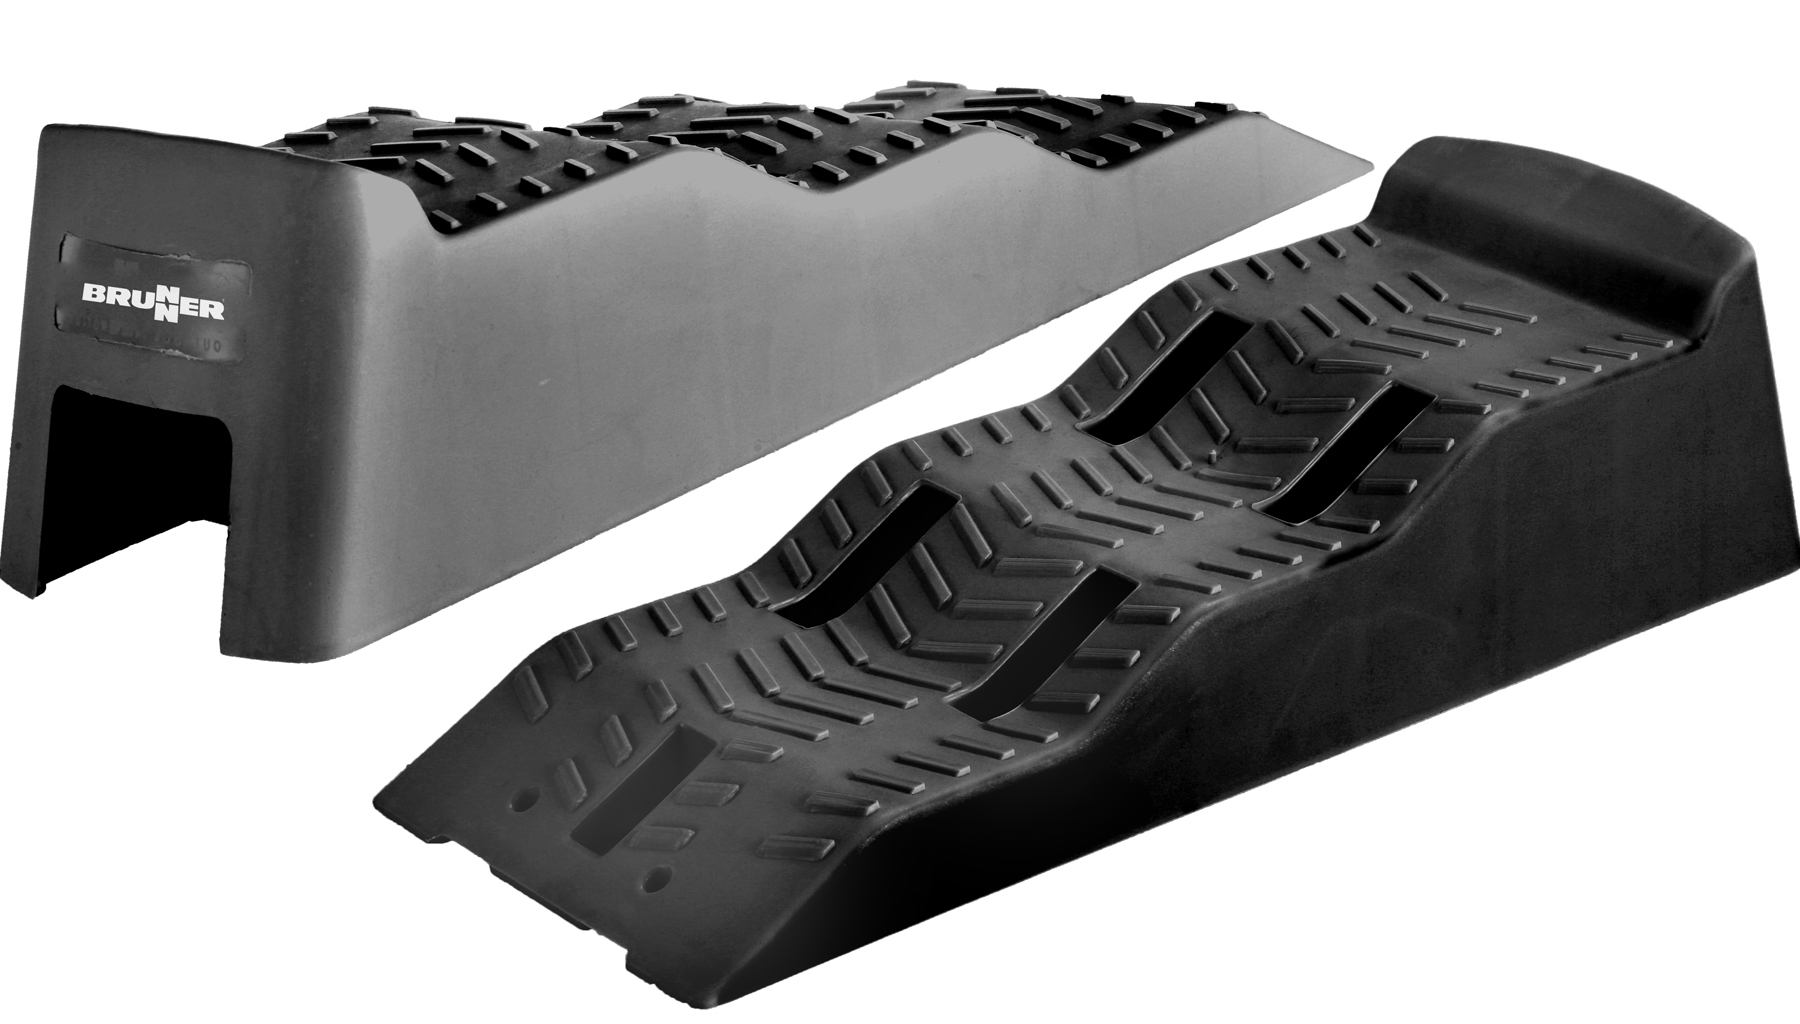 BRUNNER Cunei XL Black 7110105N